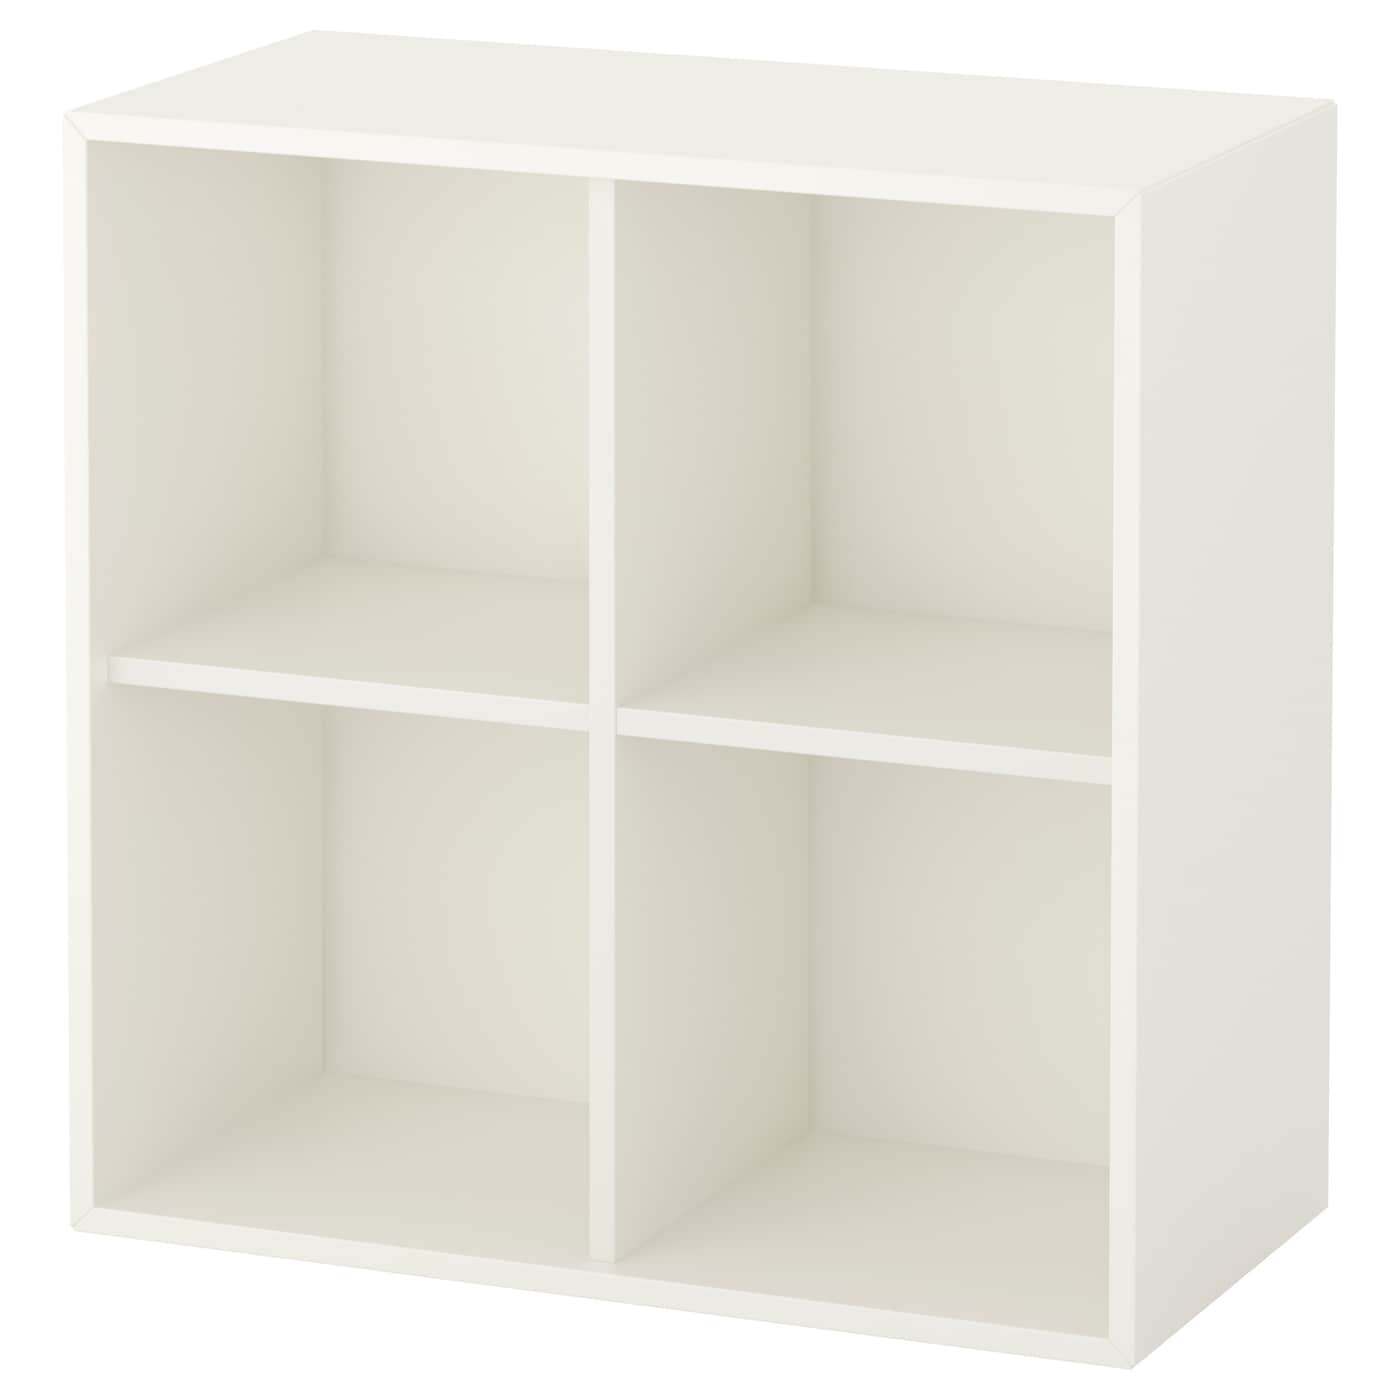 Lisabo desk ash veneer 118x45 cm ikea - Meuble rangement cube ikea ...